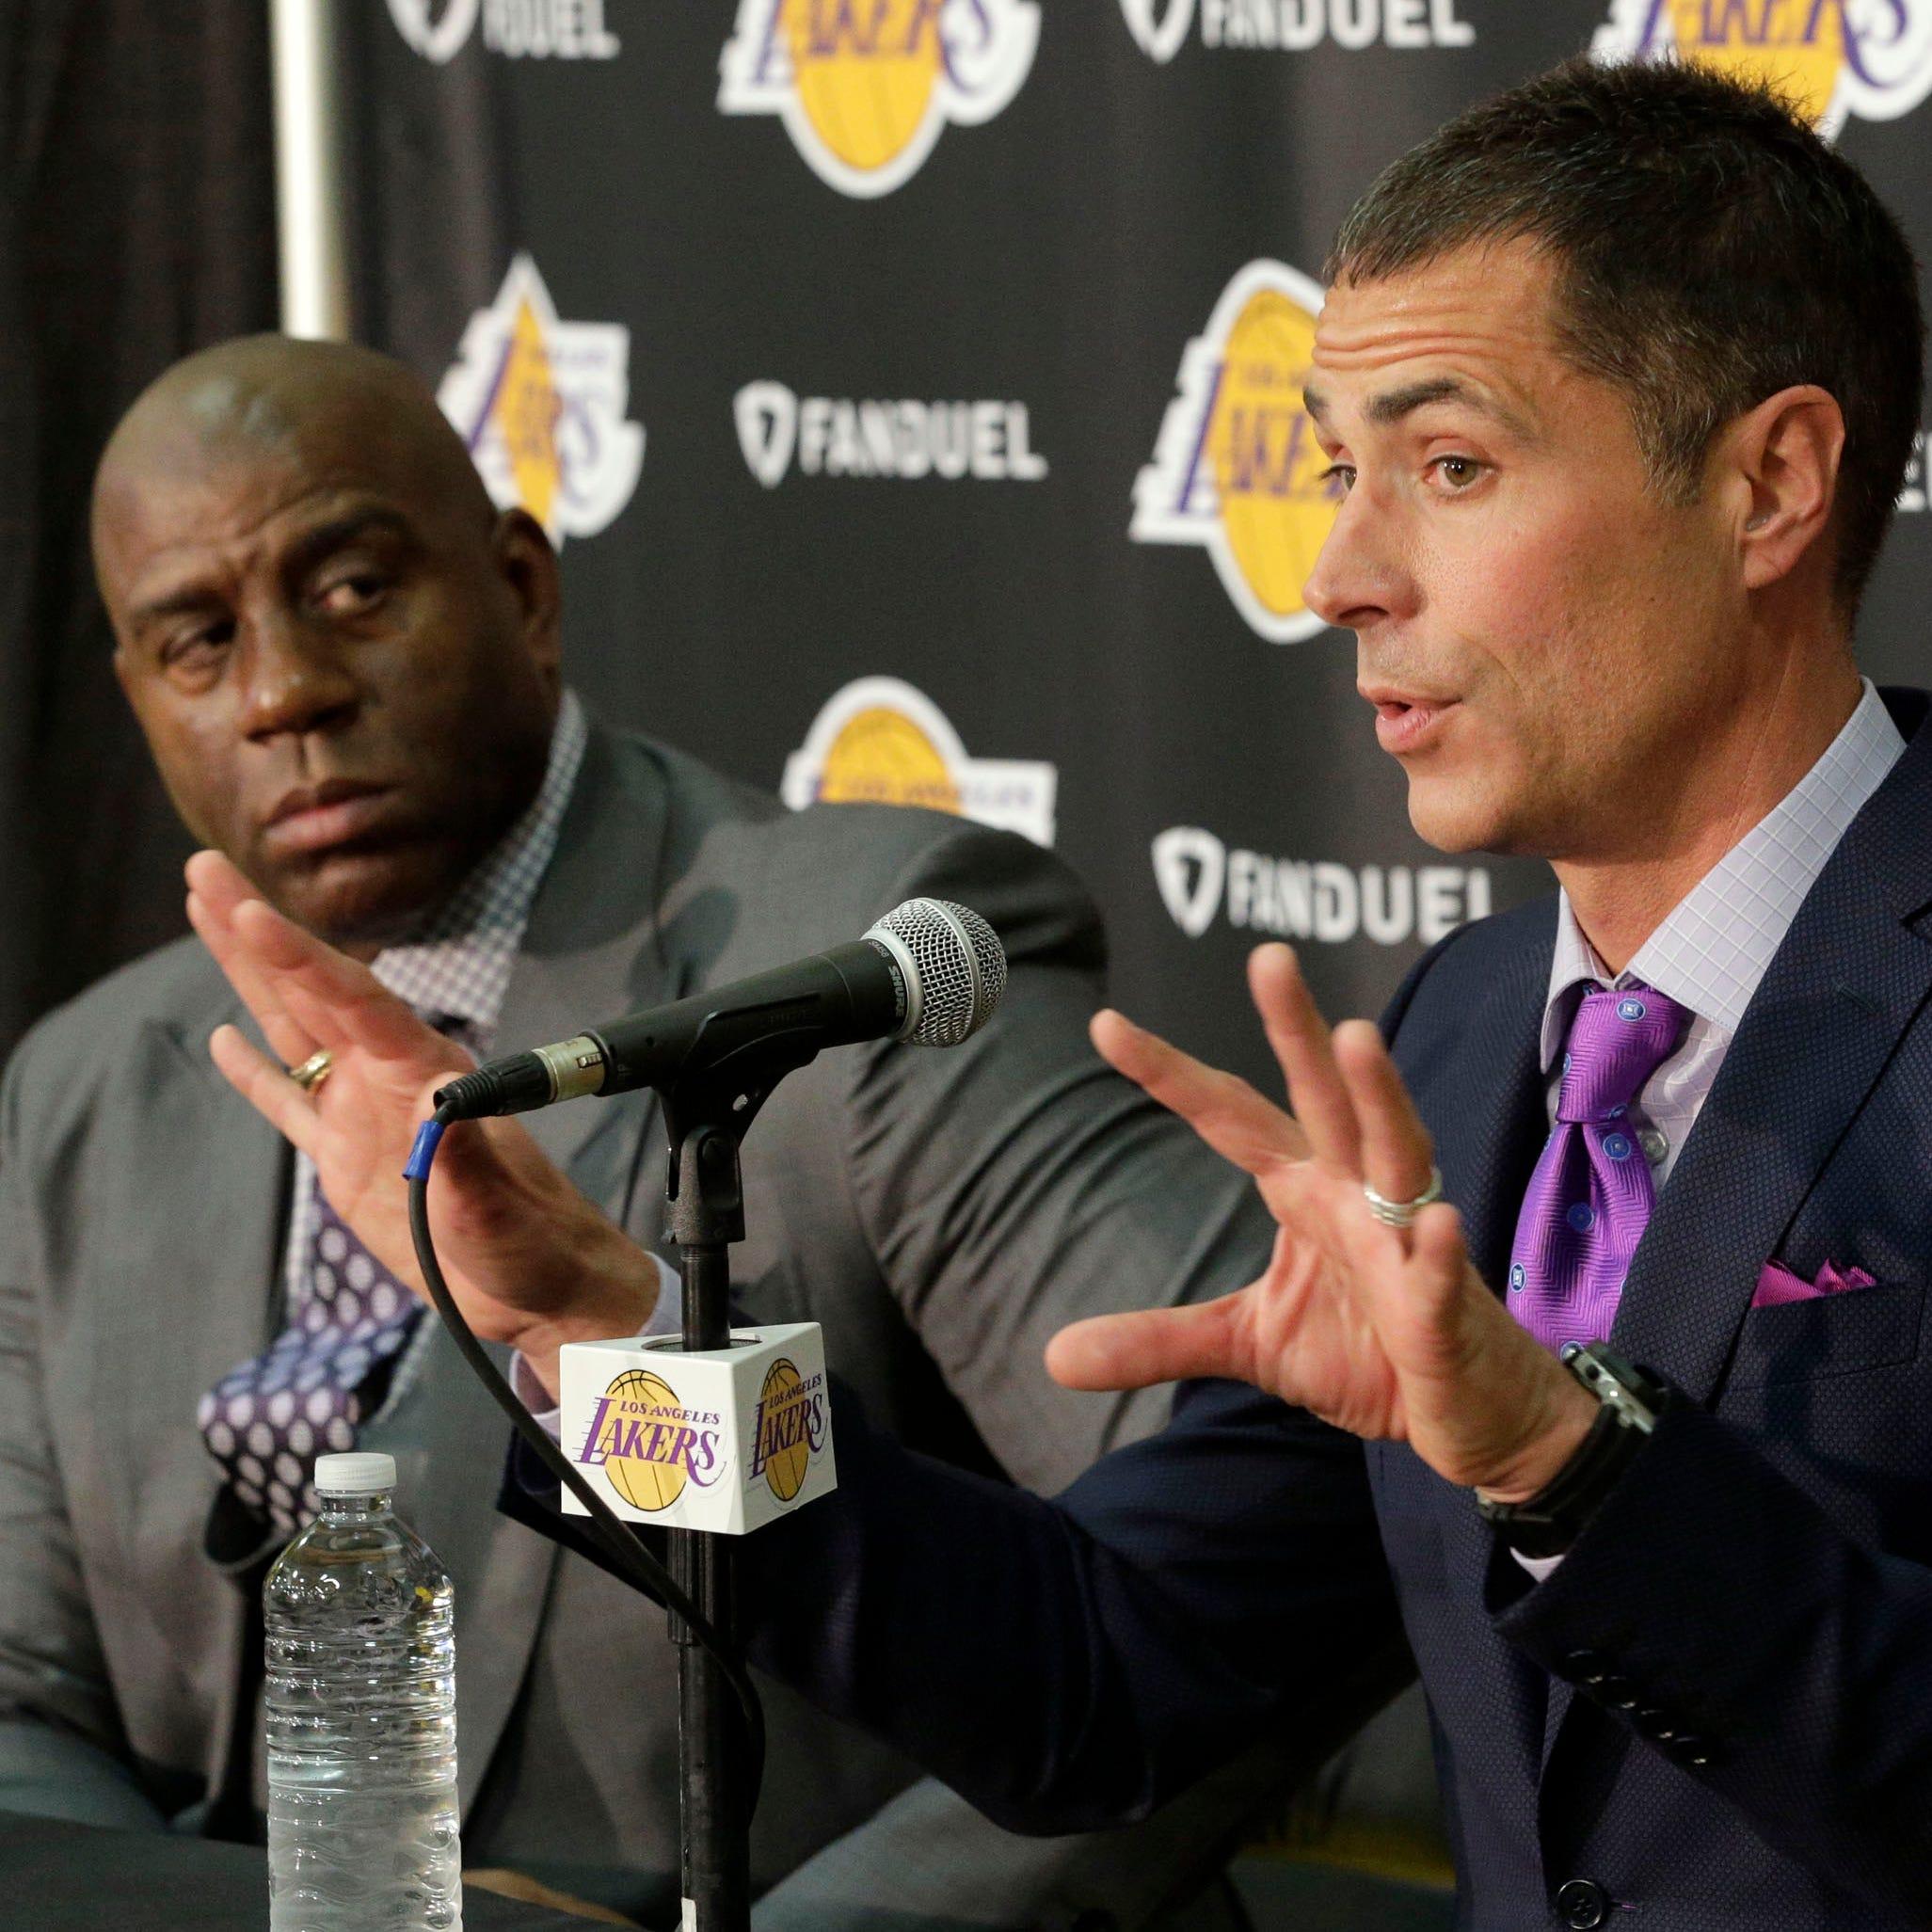 Magic Johnson says Rob Pelinka's 'backstabbing' part of reason for leaving Lakers